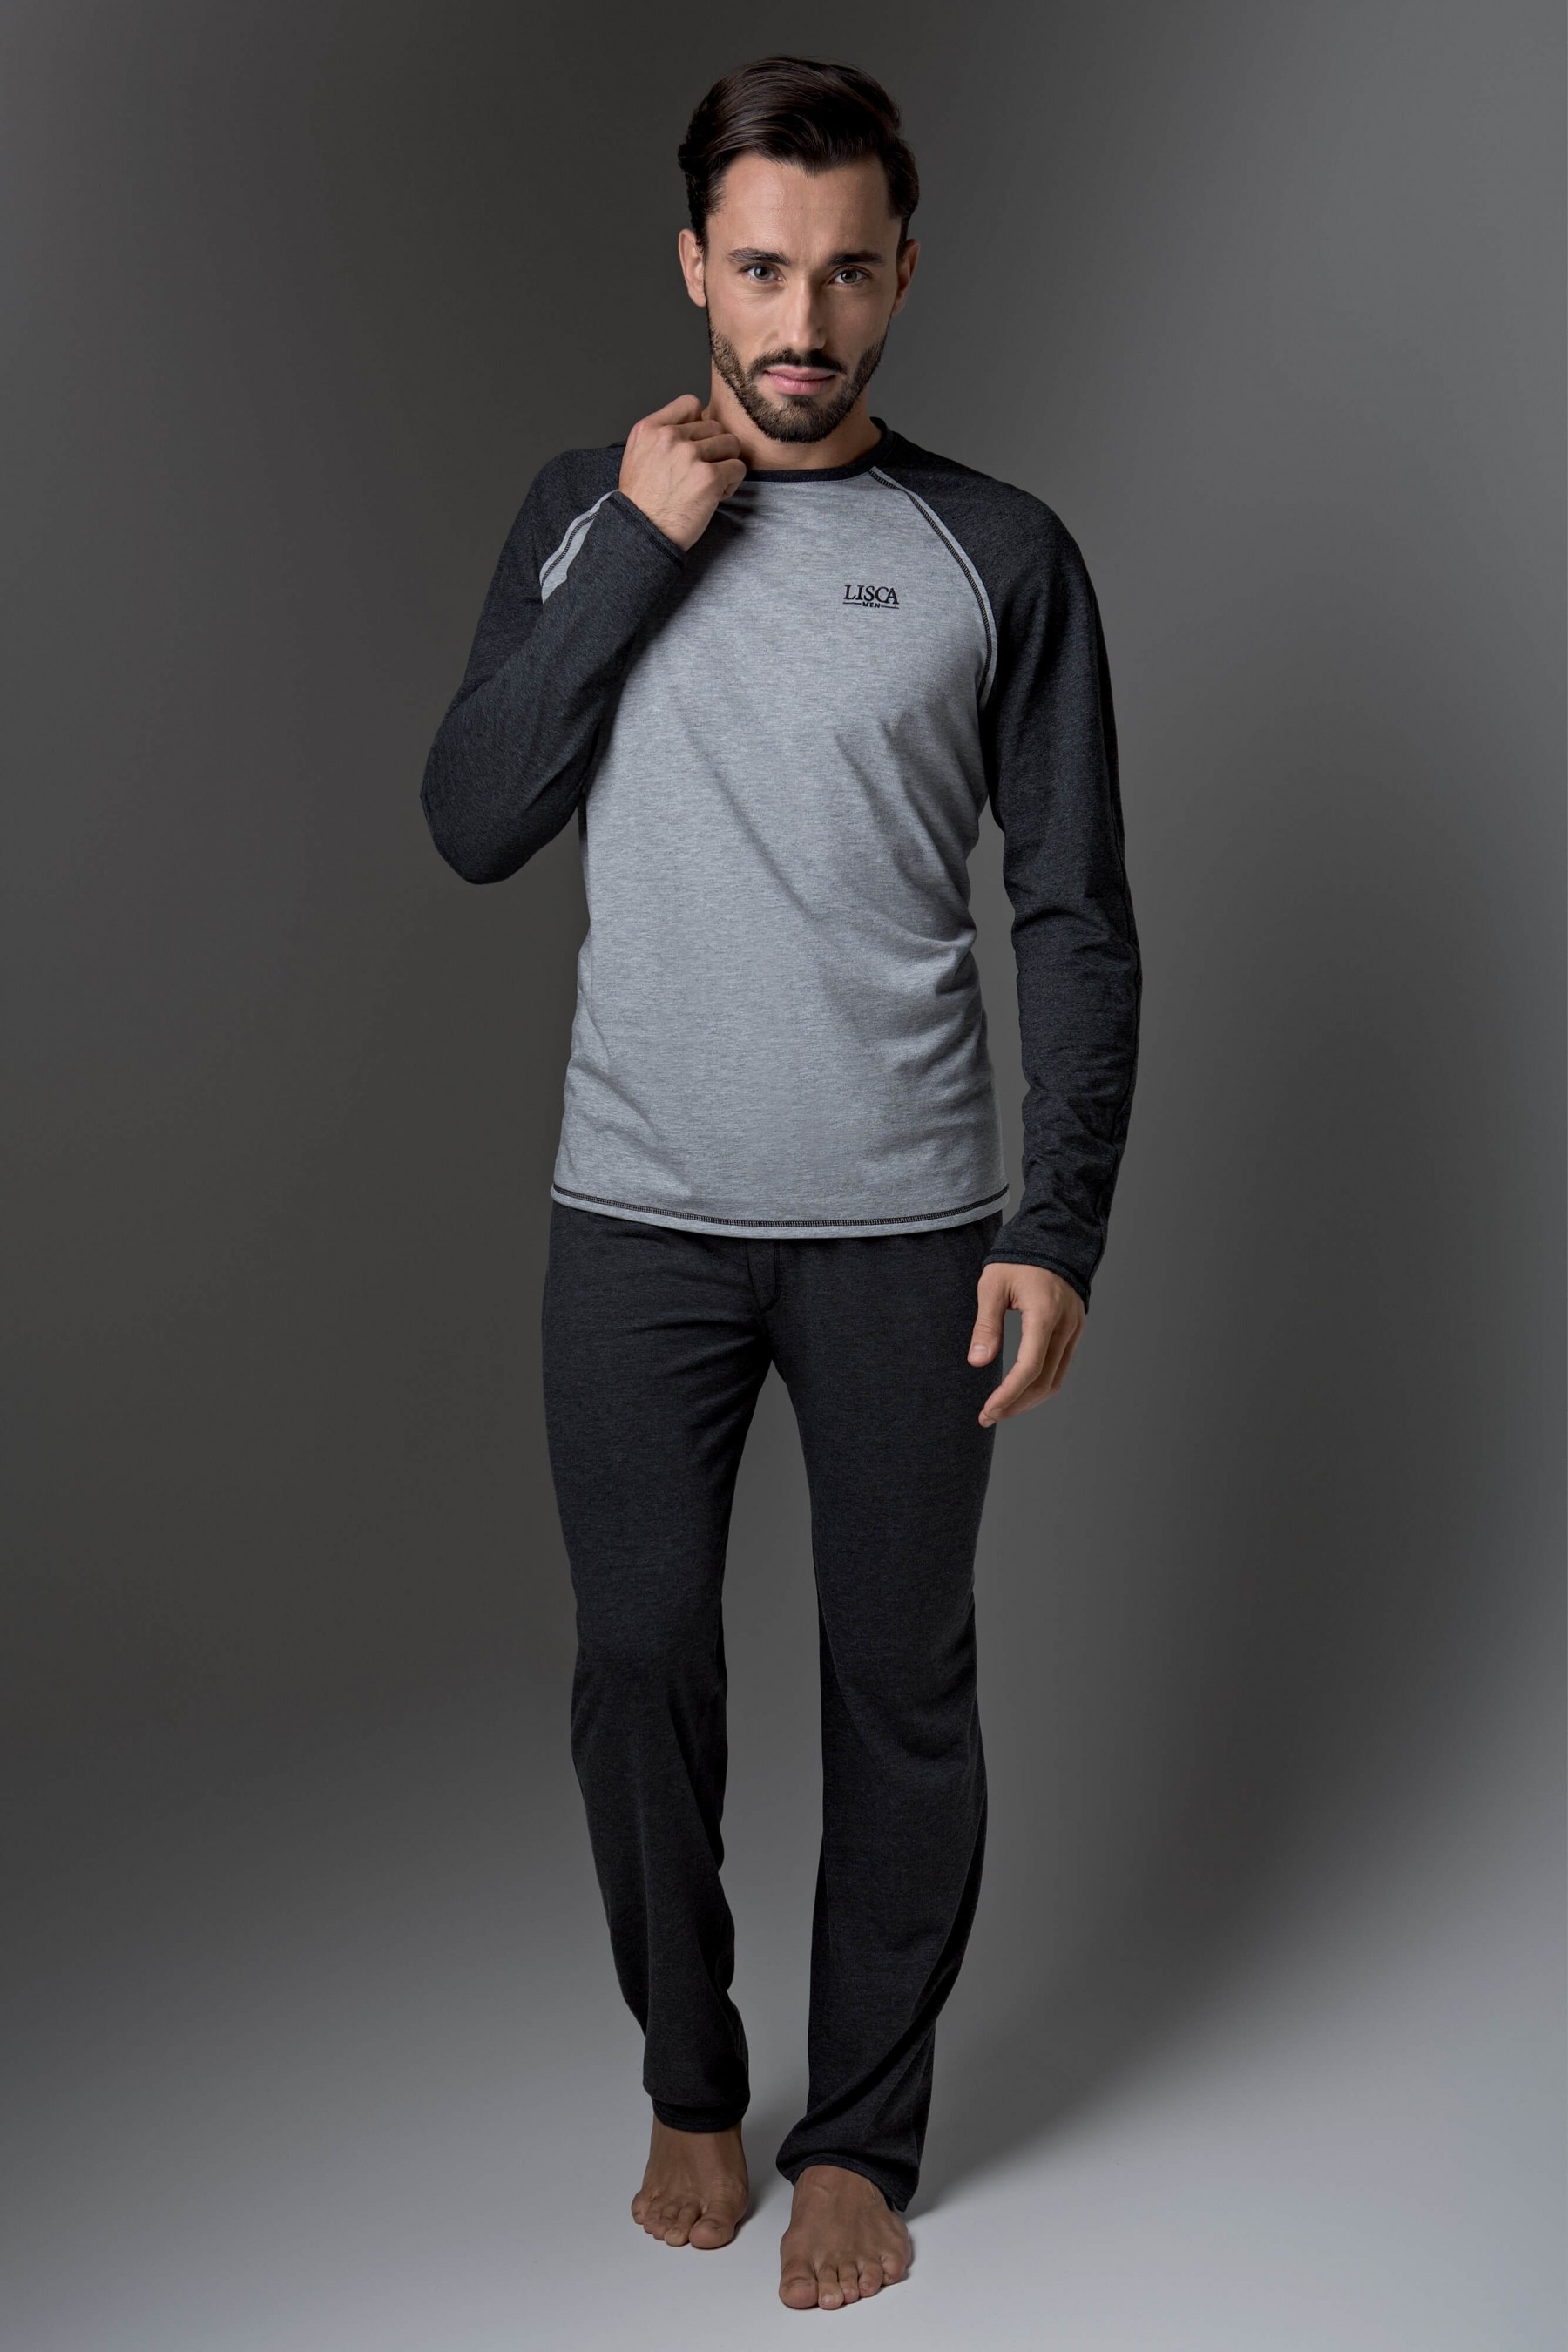 check out 1aa49 2bba9 Herren Pyjama mit langen Hosen »Thor« - Moderne Dessous, BHs ...